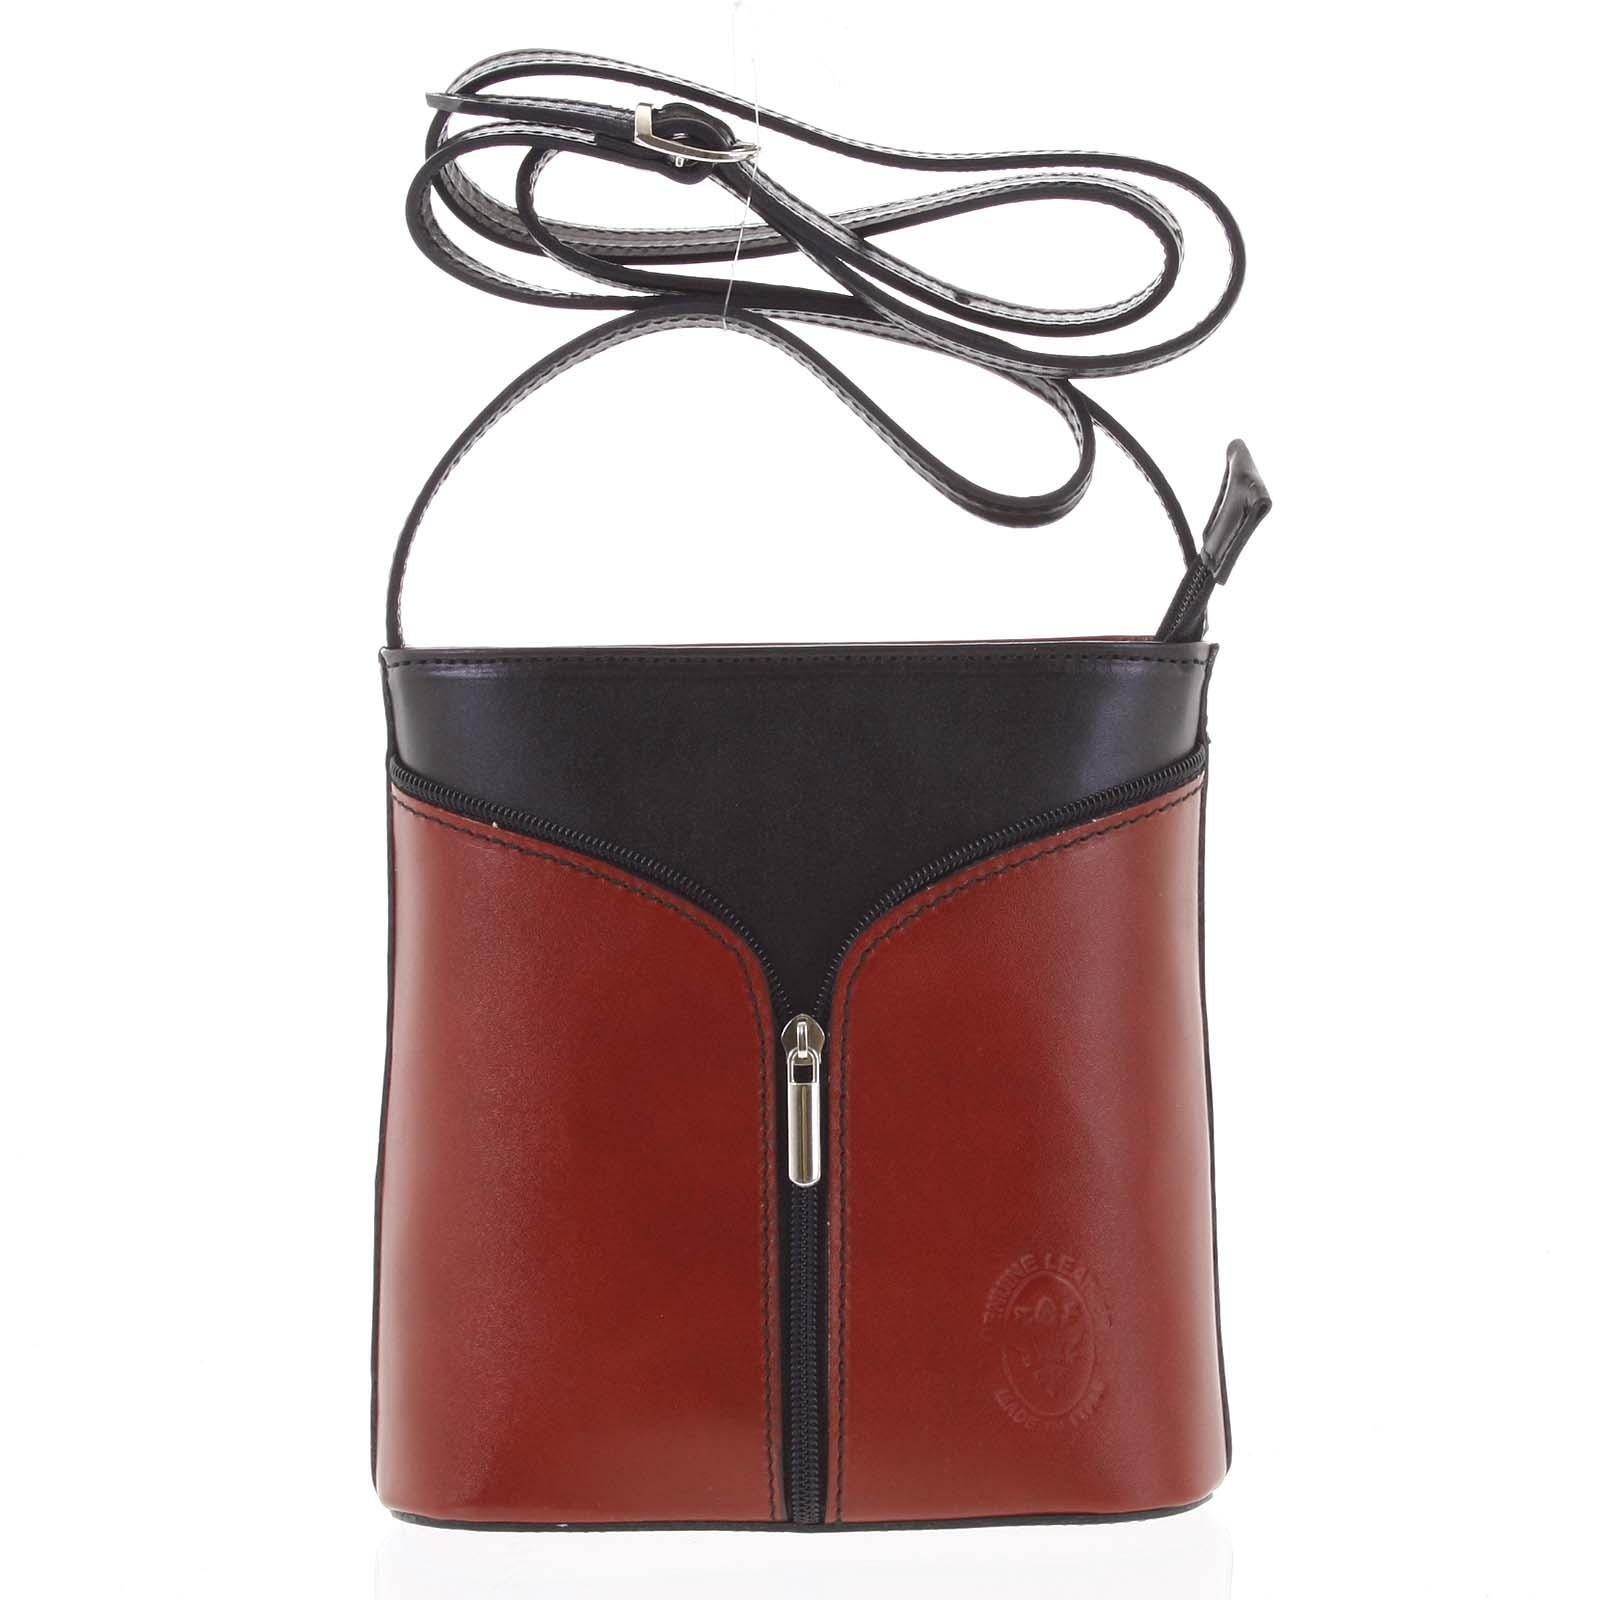 Dámská kožená crossbody kabelka červeno černá - ItalY Hallie